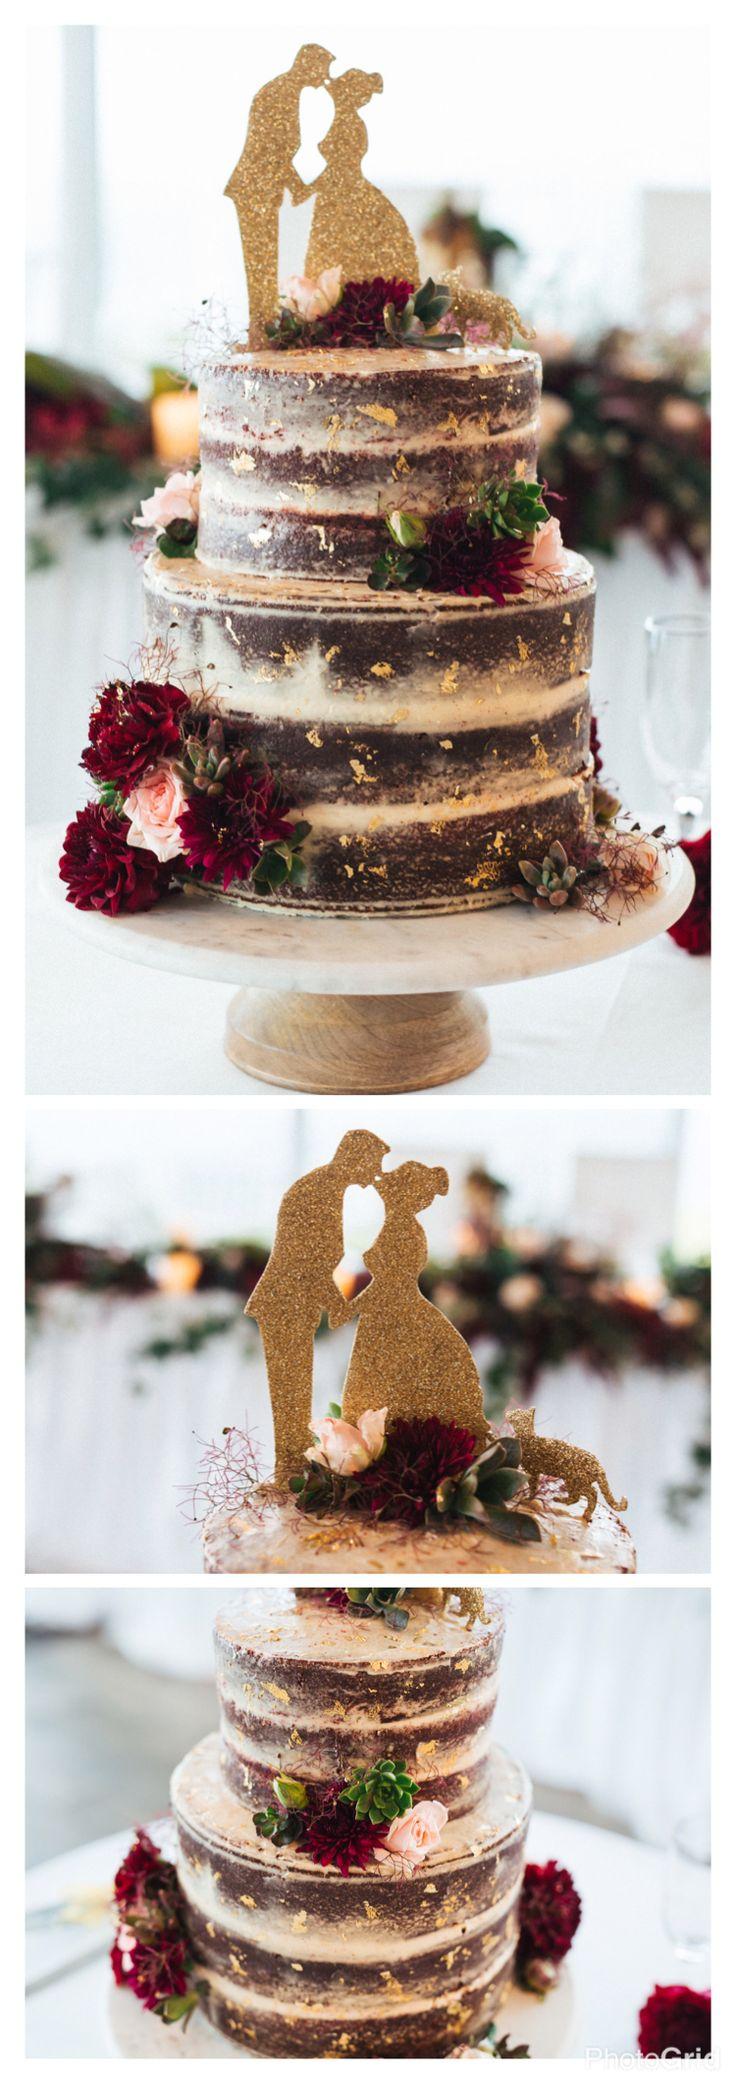 best wedding ideas images on pinterest weddings cake wedding